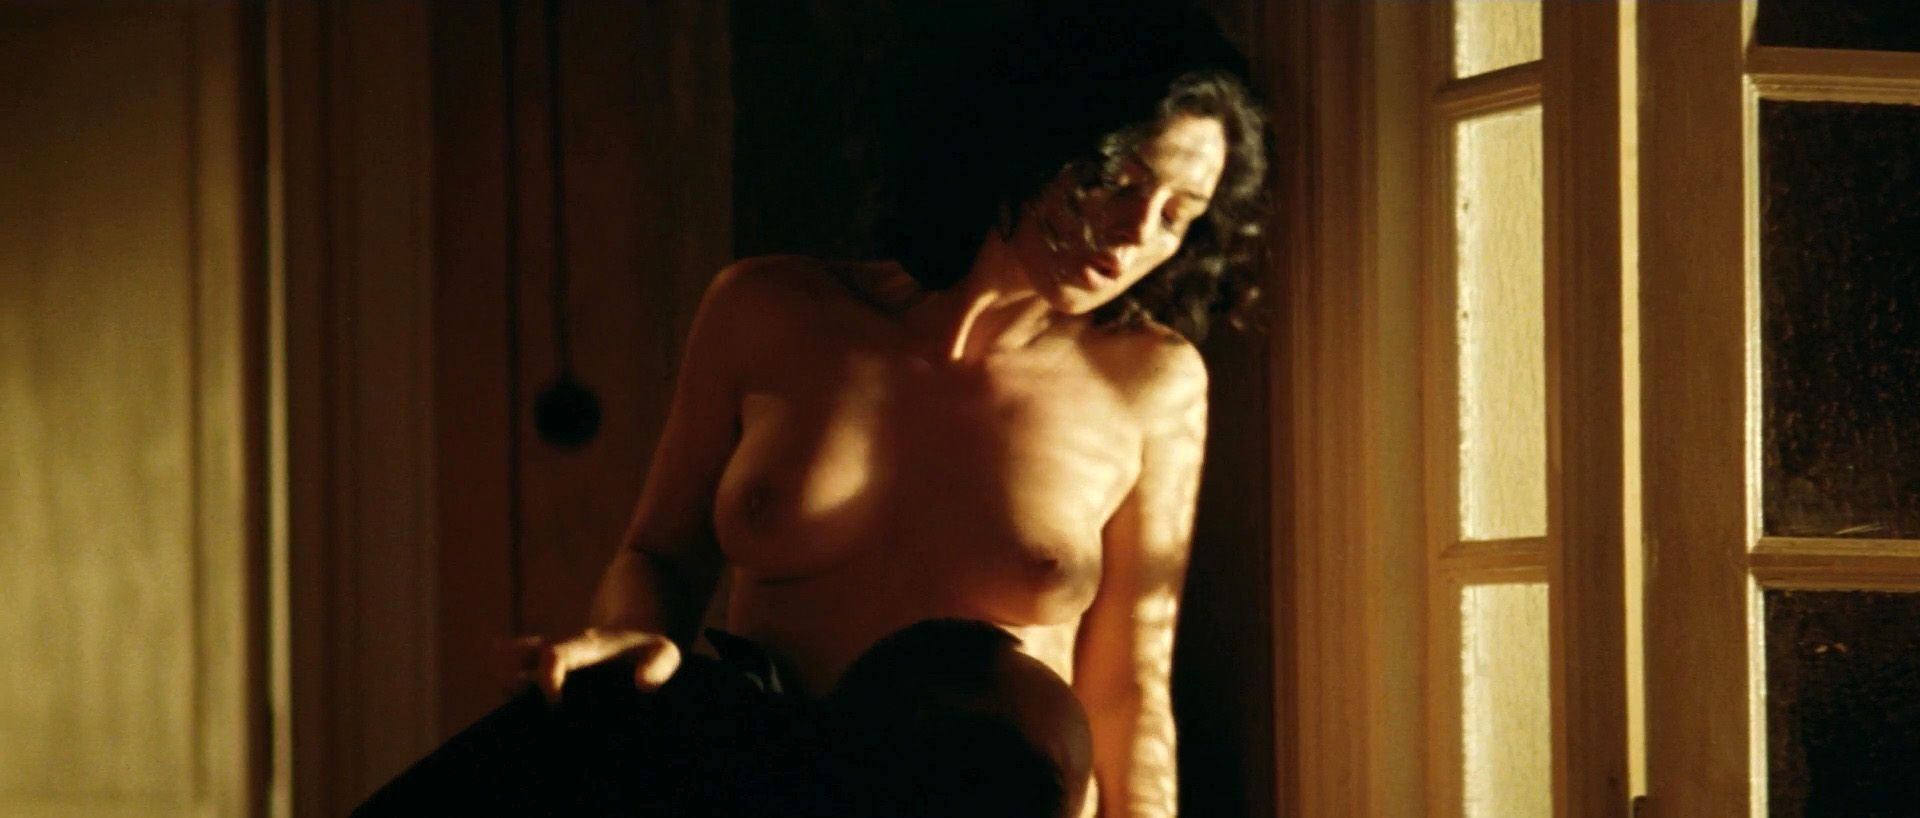 bellucci malena nude jpg 1200x900